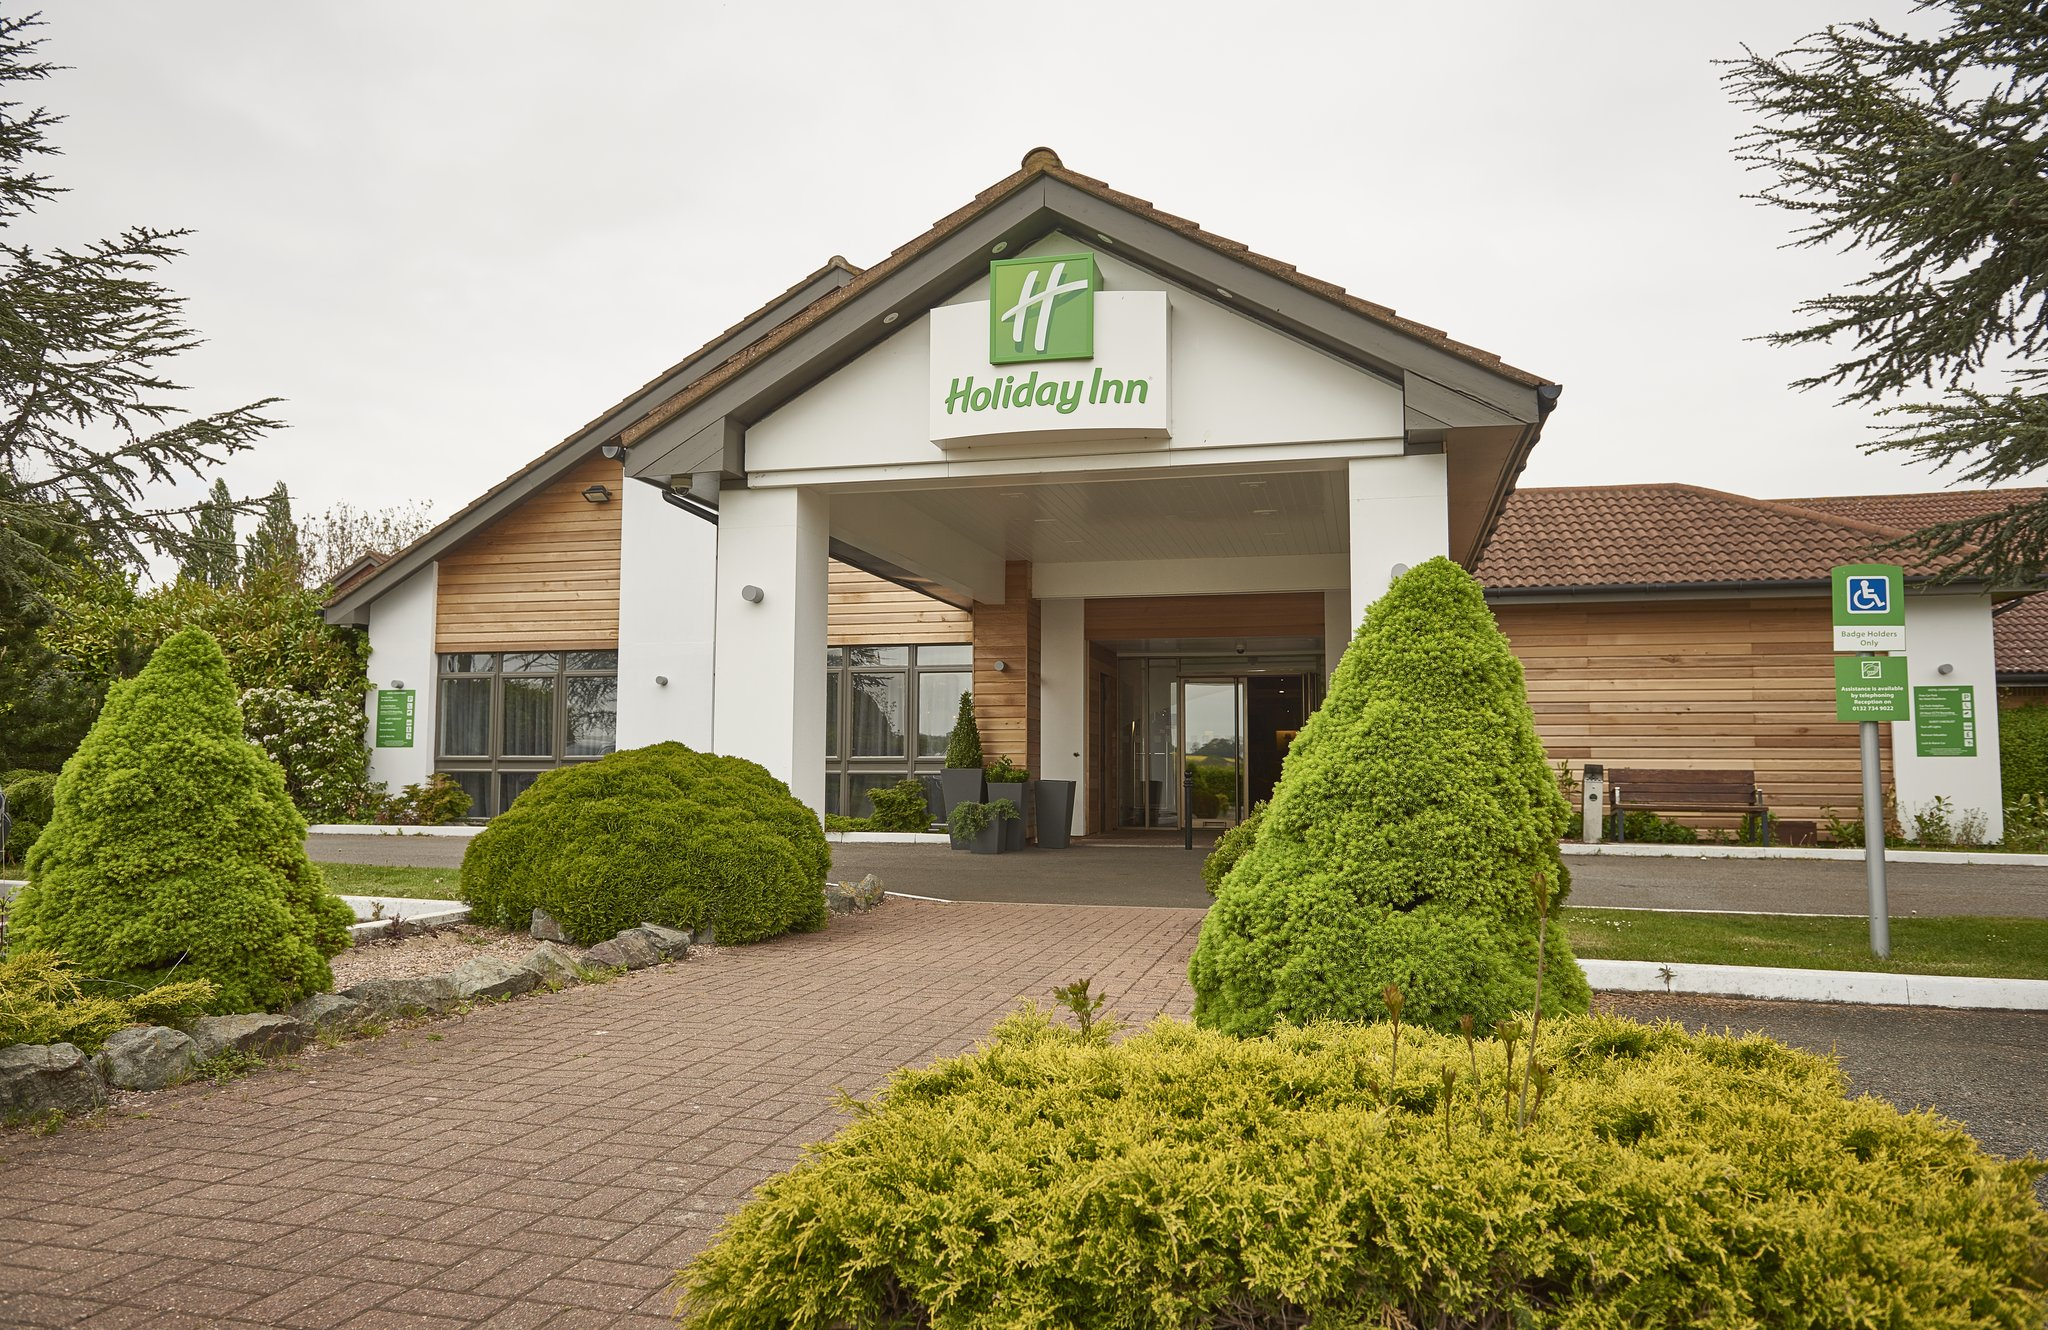 Holiday Inn Northampton West M1, J16